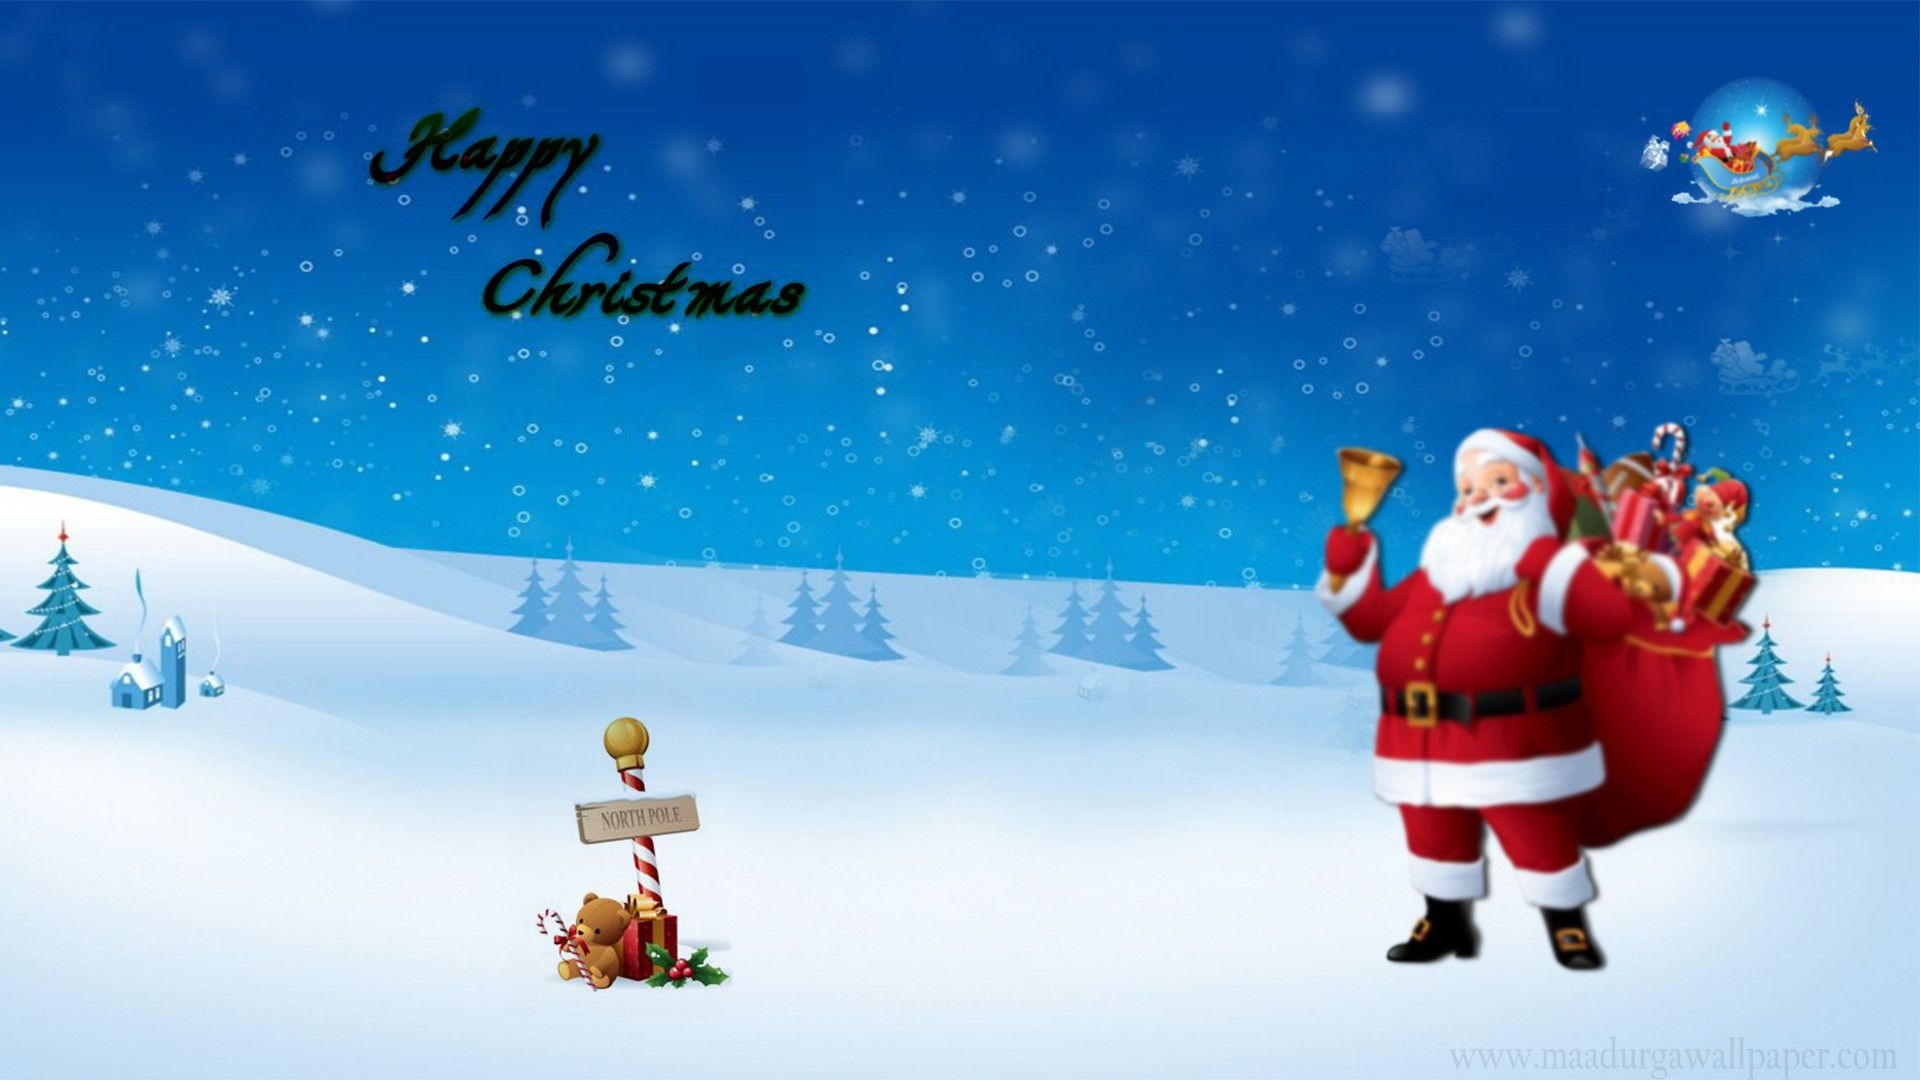 Santa Claus image & hd wallpaper download free